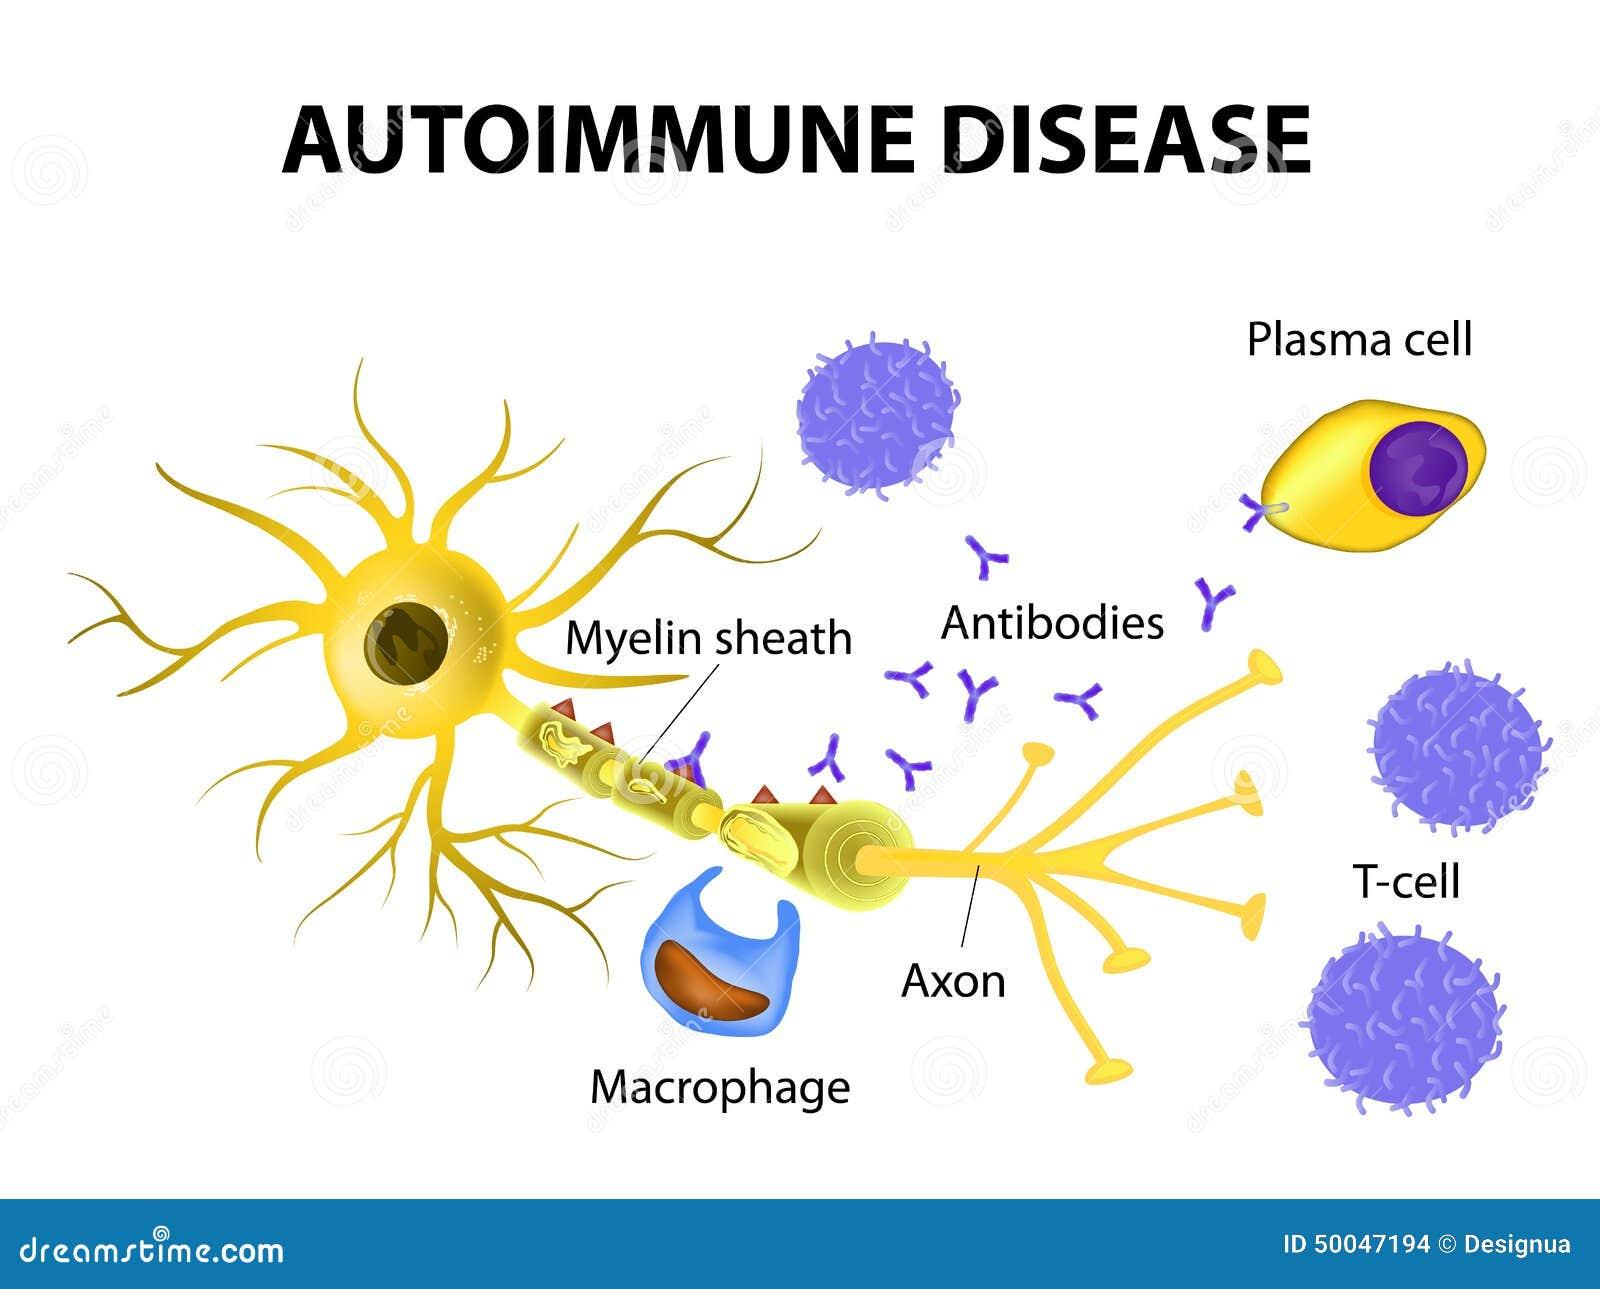 1300 x 1064 jpeg 114kBOligodendrocytes